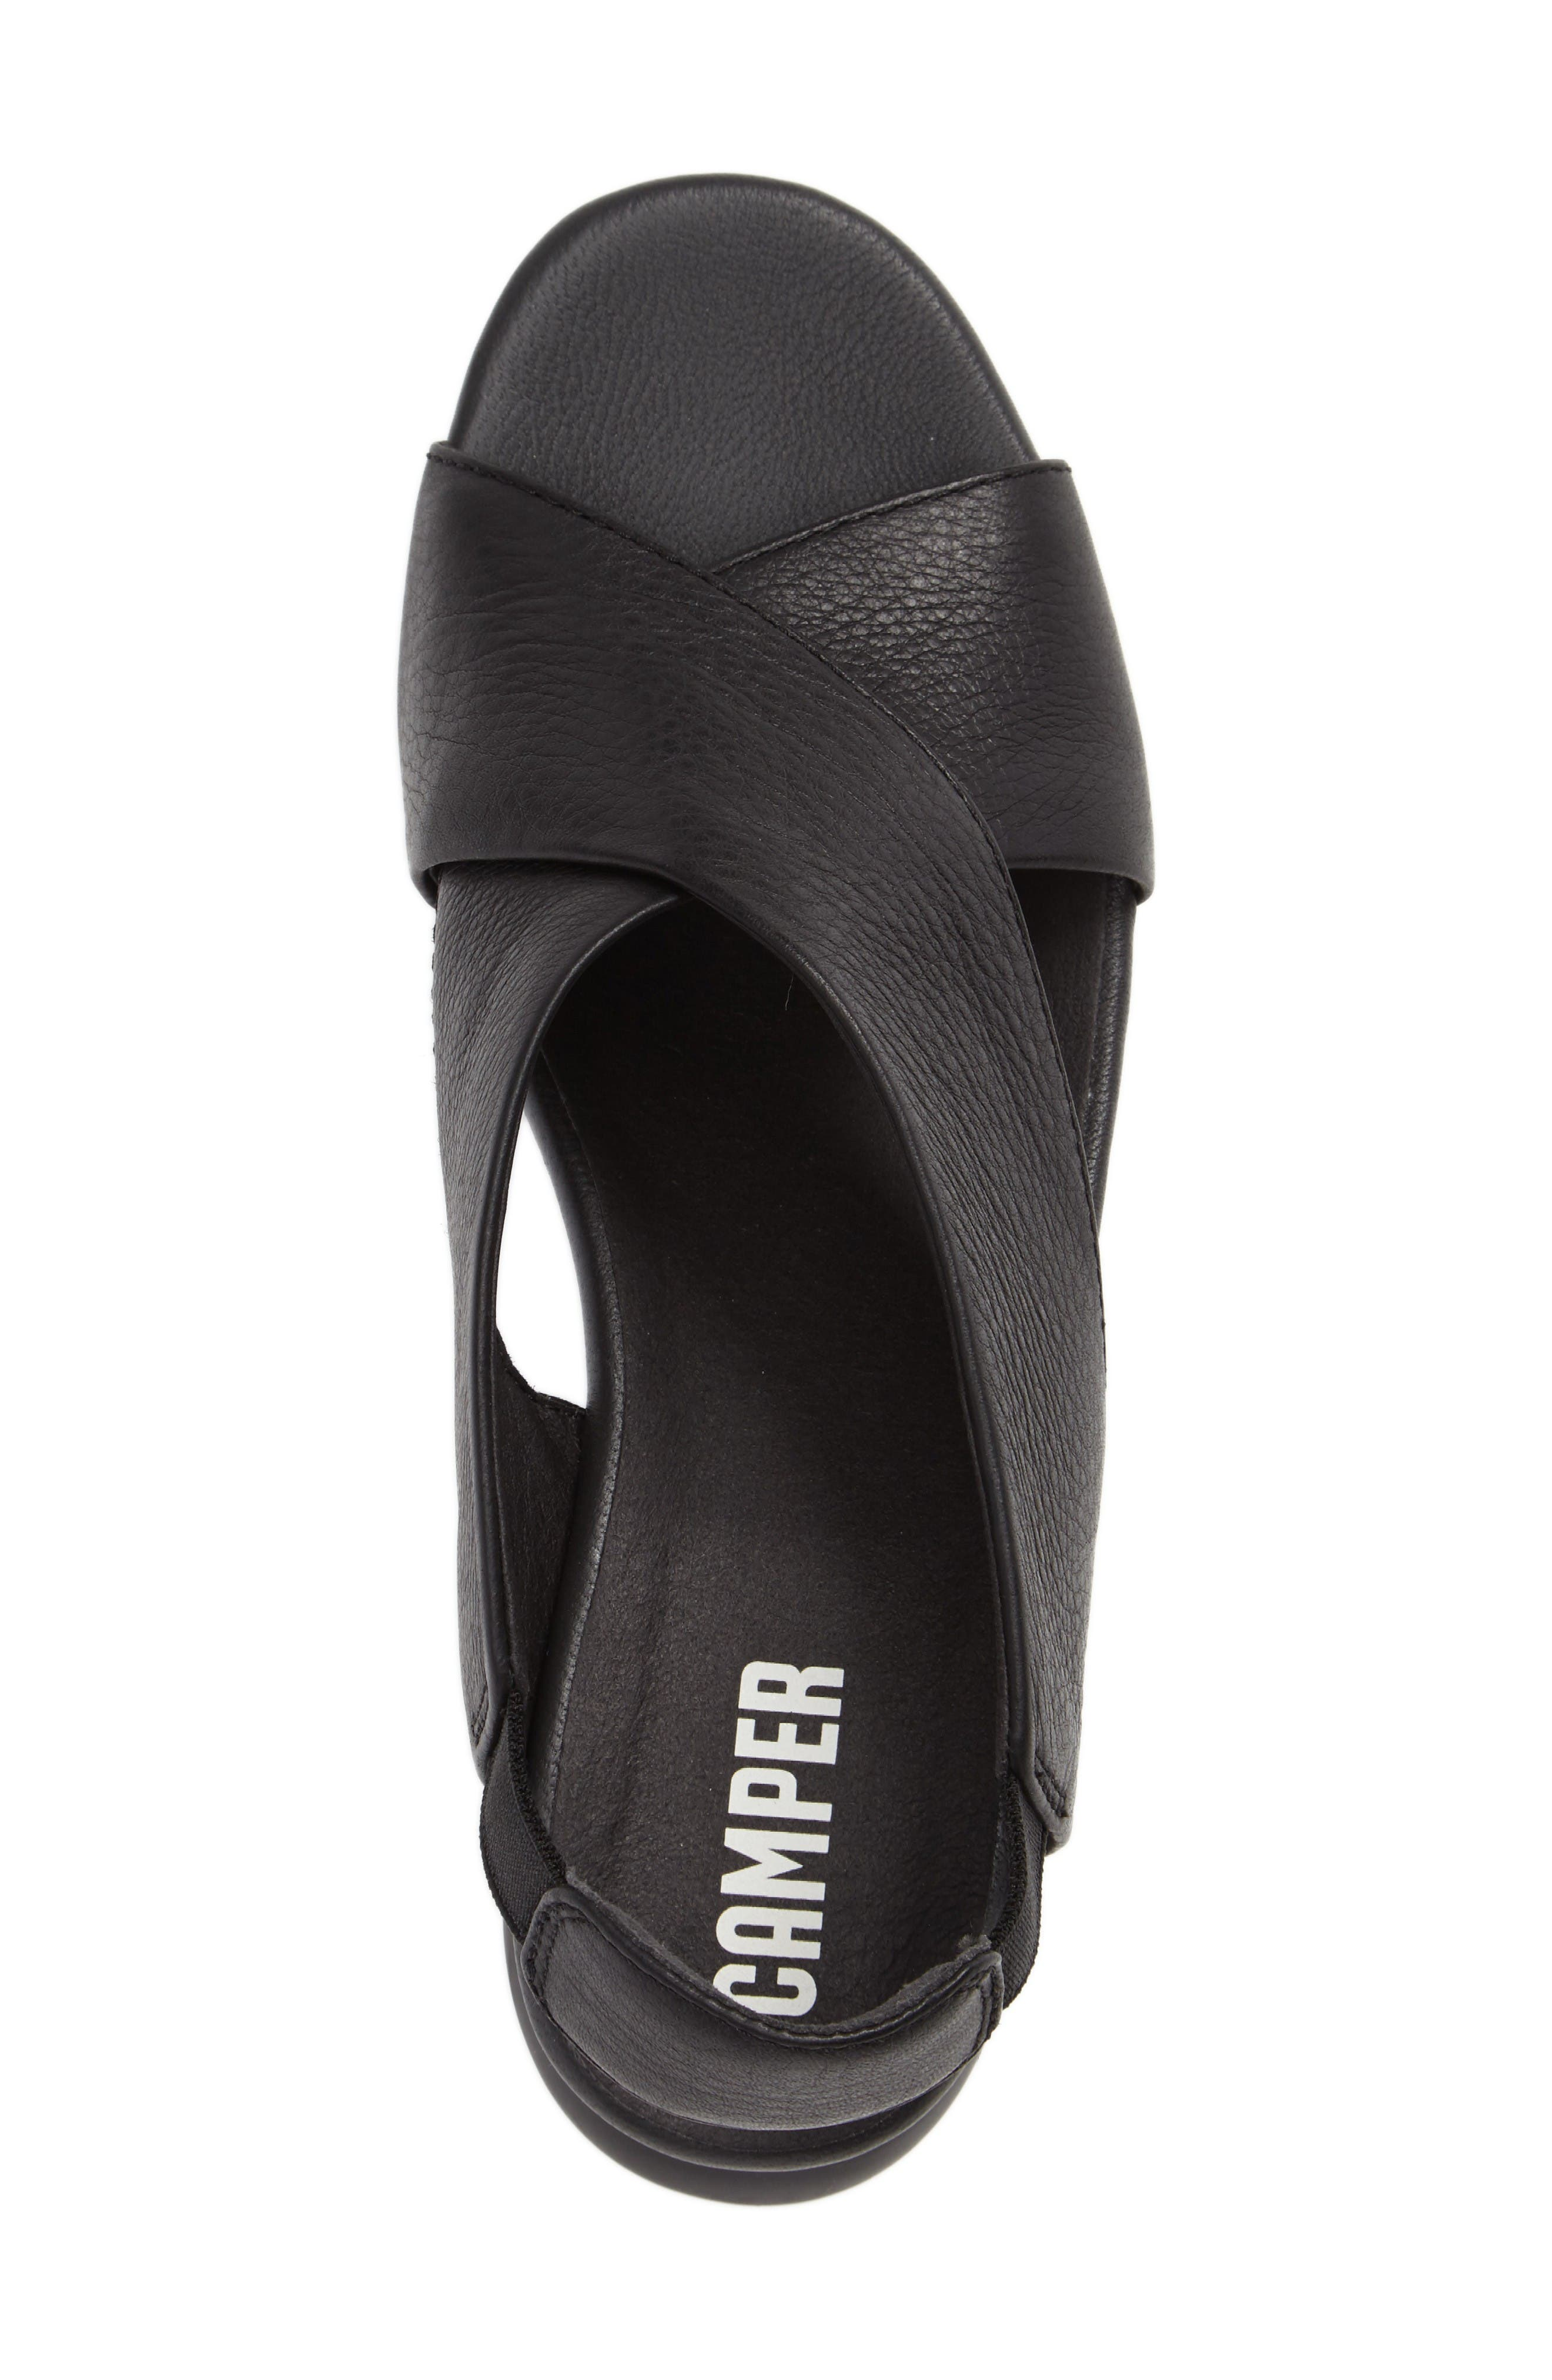 Balloon Slingback Wedge Sandal,                             Alternate thumbnail 3, color,                             Black Leather